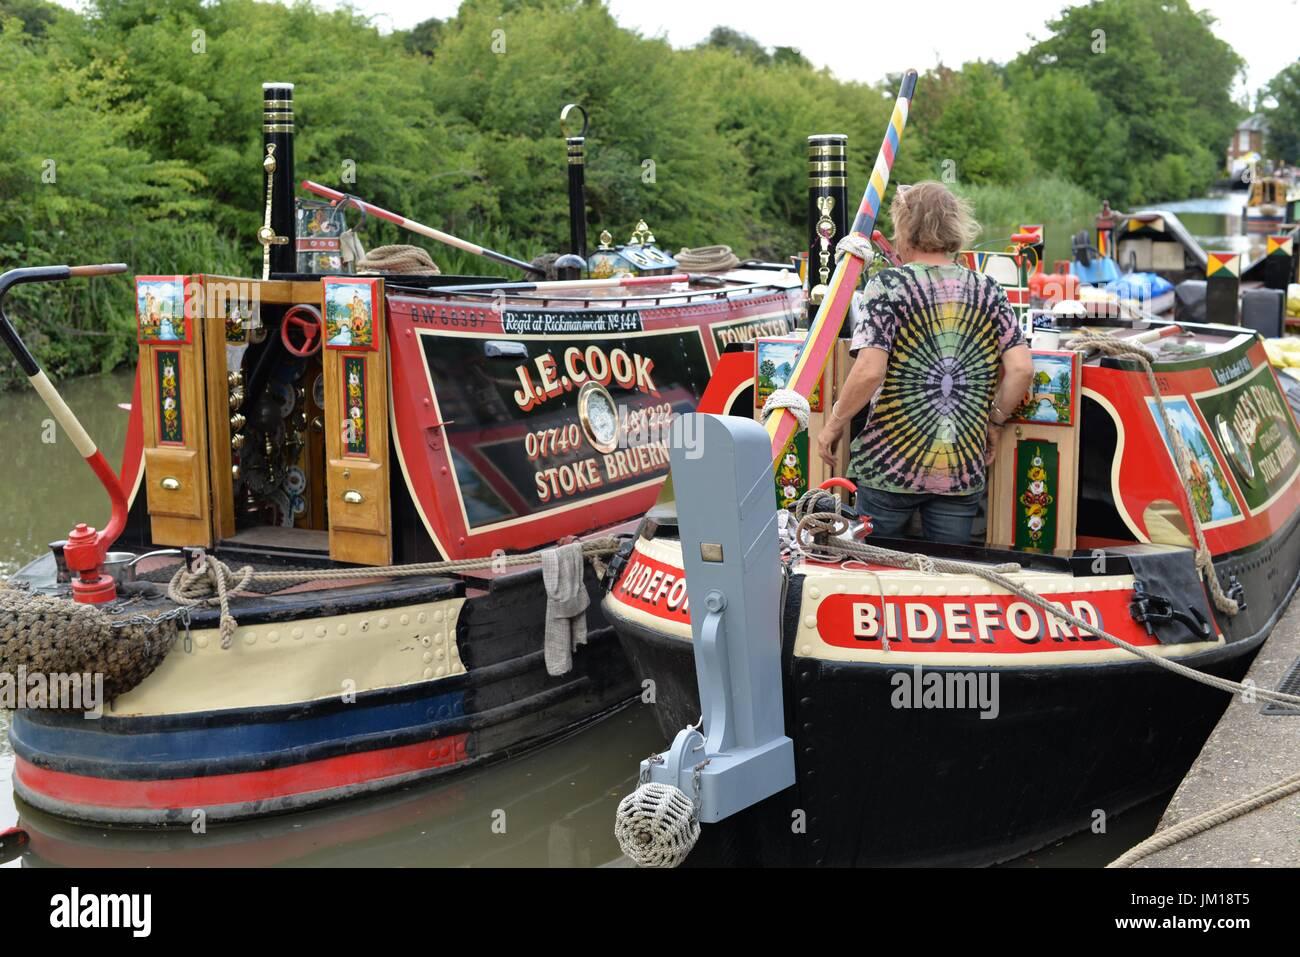 Braunston Historic Boat Show 2017 - Stock Image